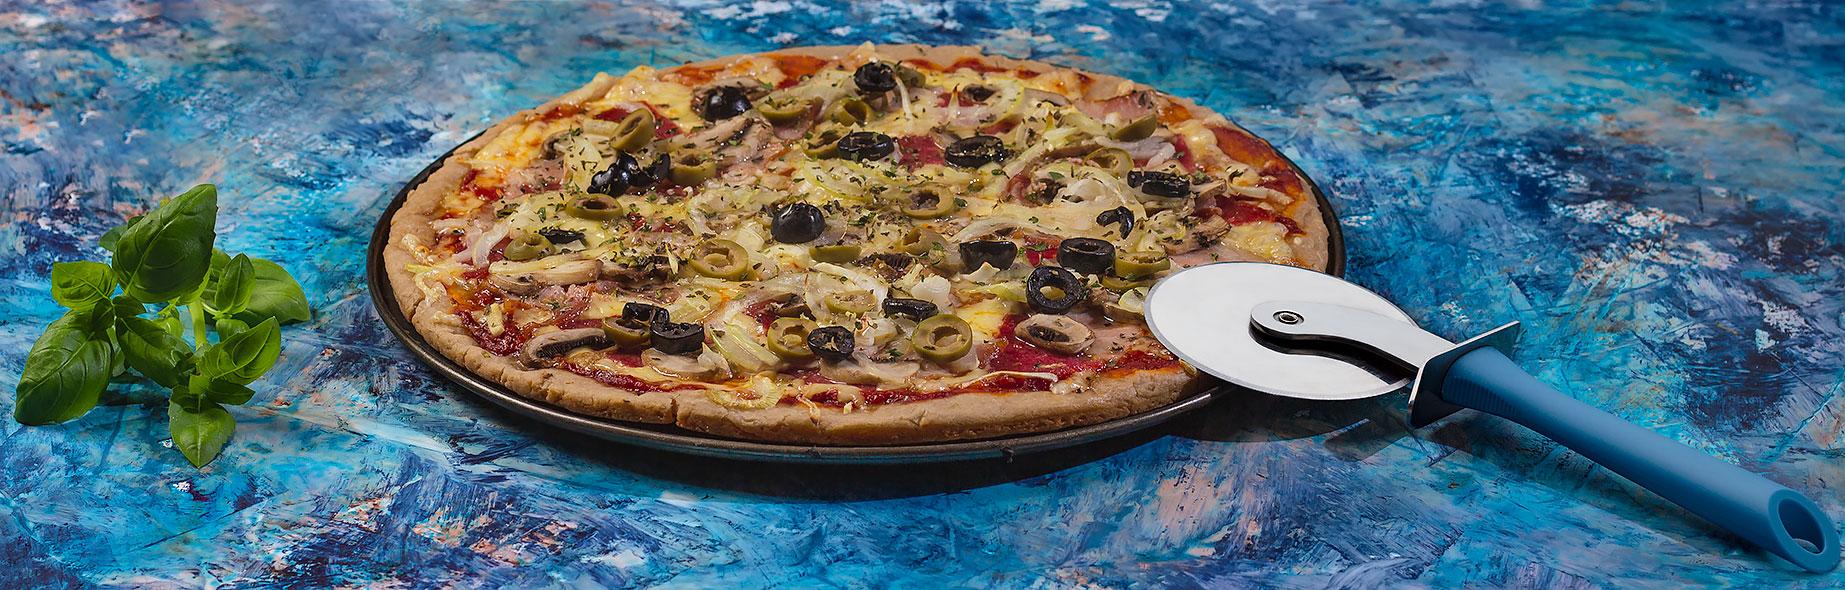 Pizza - fotografia kulinarna - Orbin studio